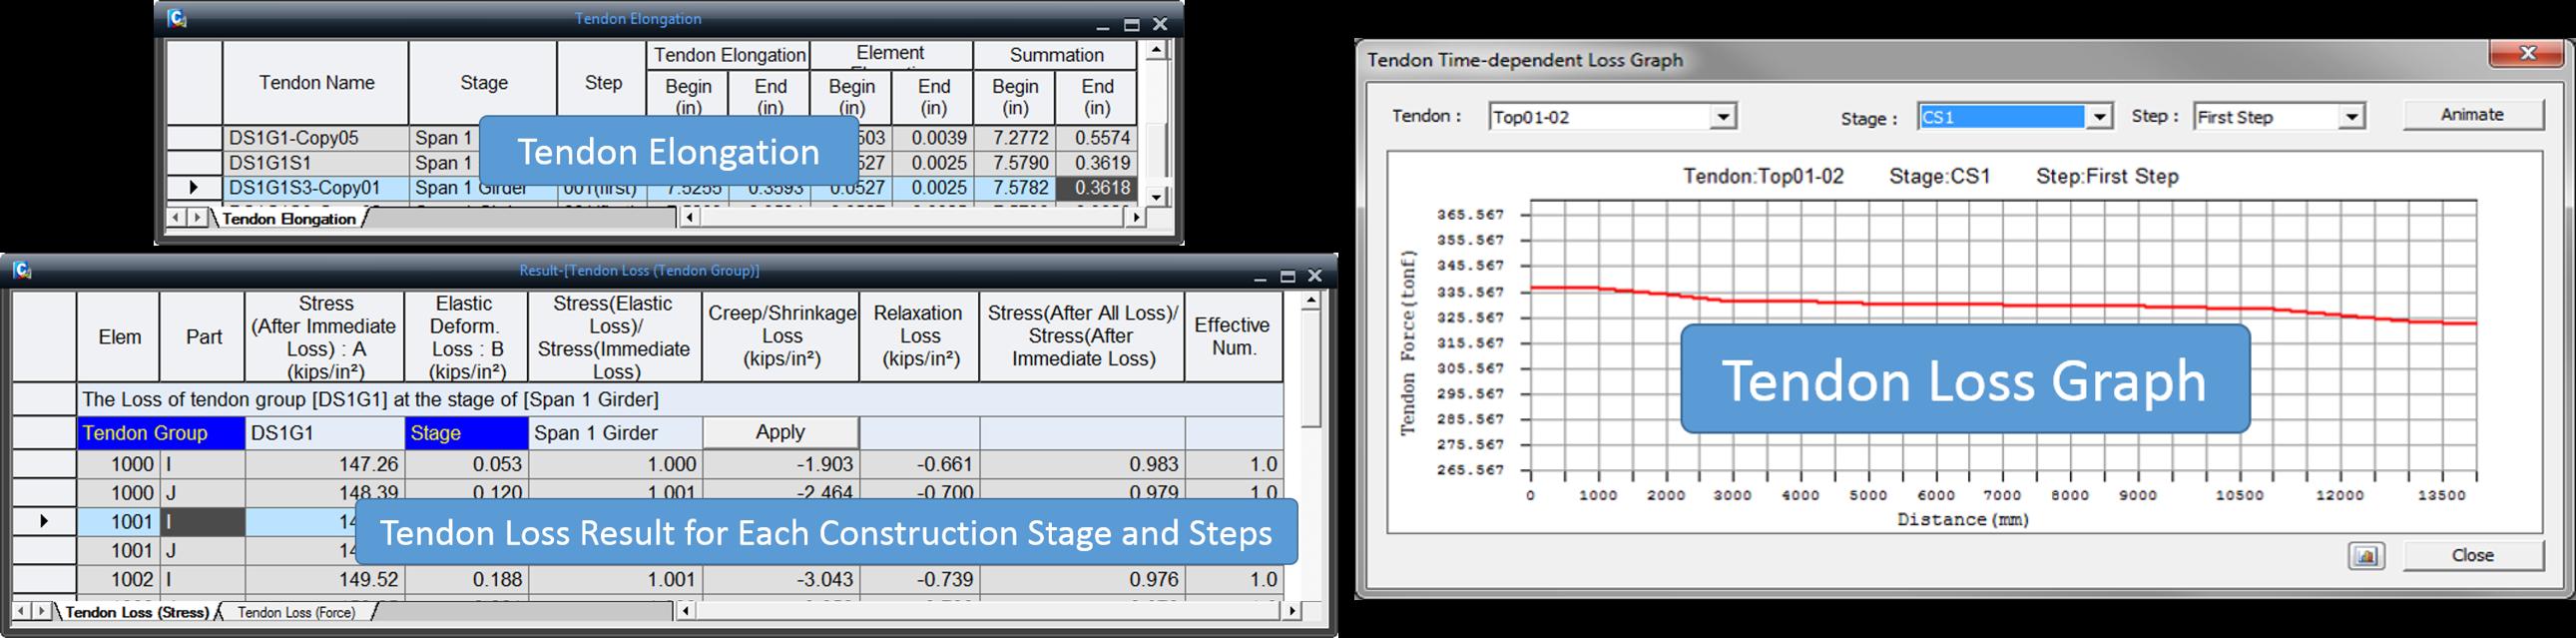 Licensed-Tendon Elongation, Tendon Loss Result, Tendon Loss Graph-MIDASoft